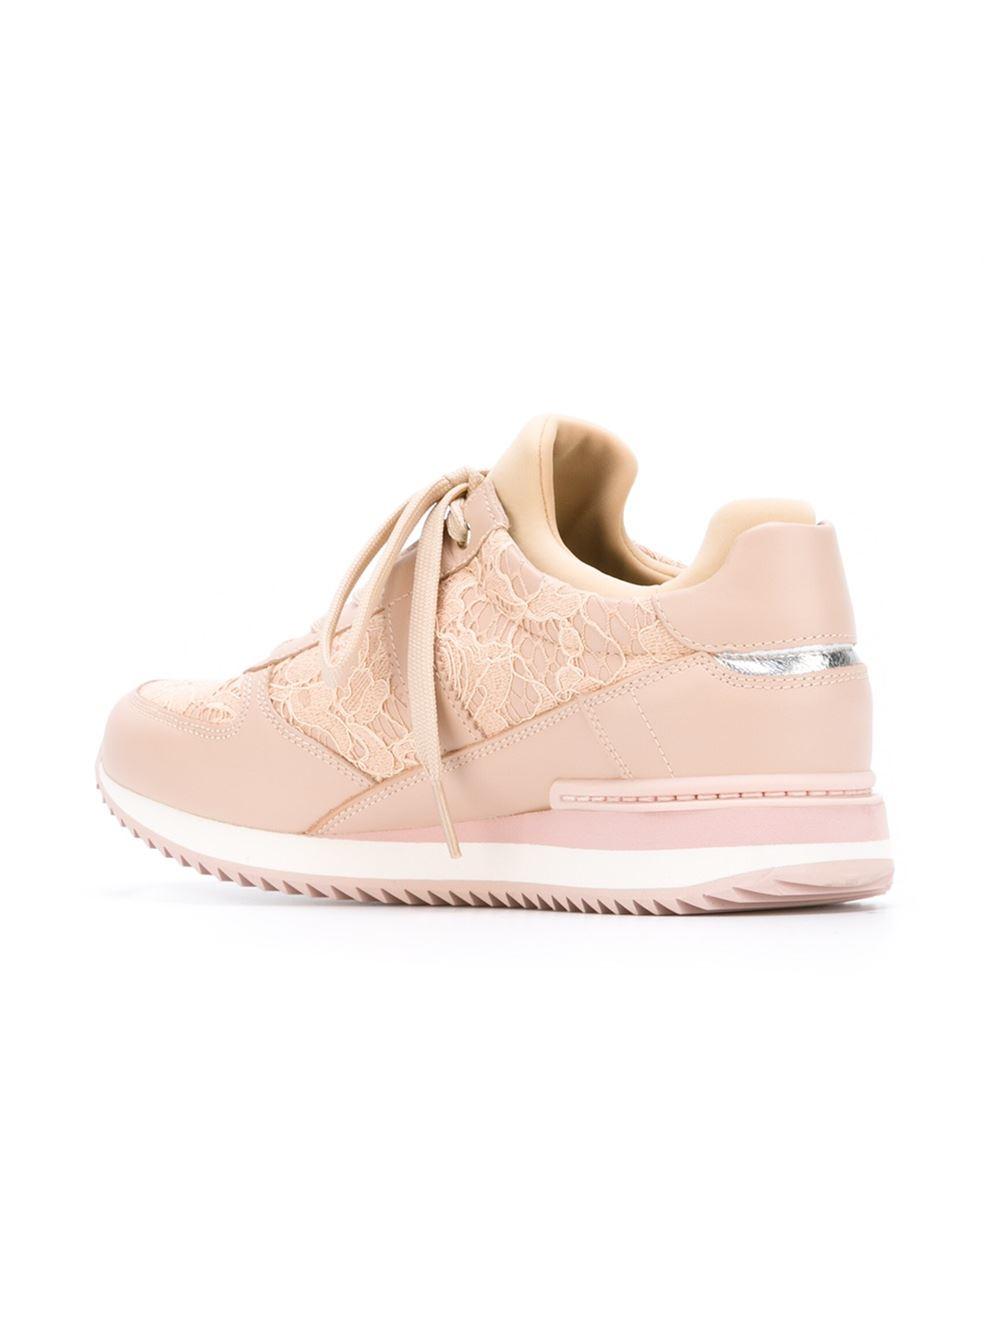 dolce gabbana lace sneakers in beige pink purple lyst. Black Bedroom Furniture Sets. Home Design Ideas